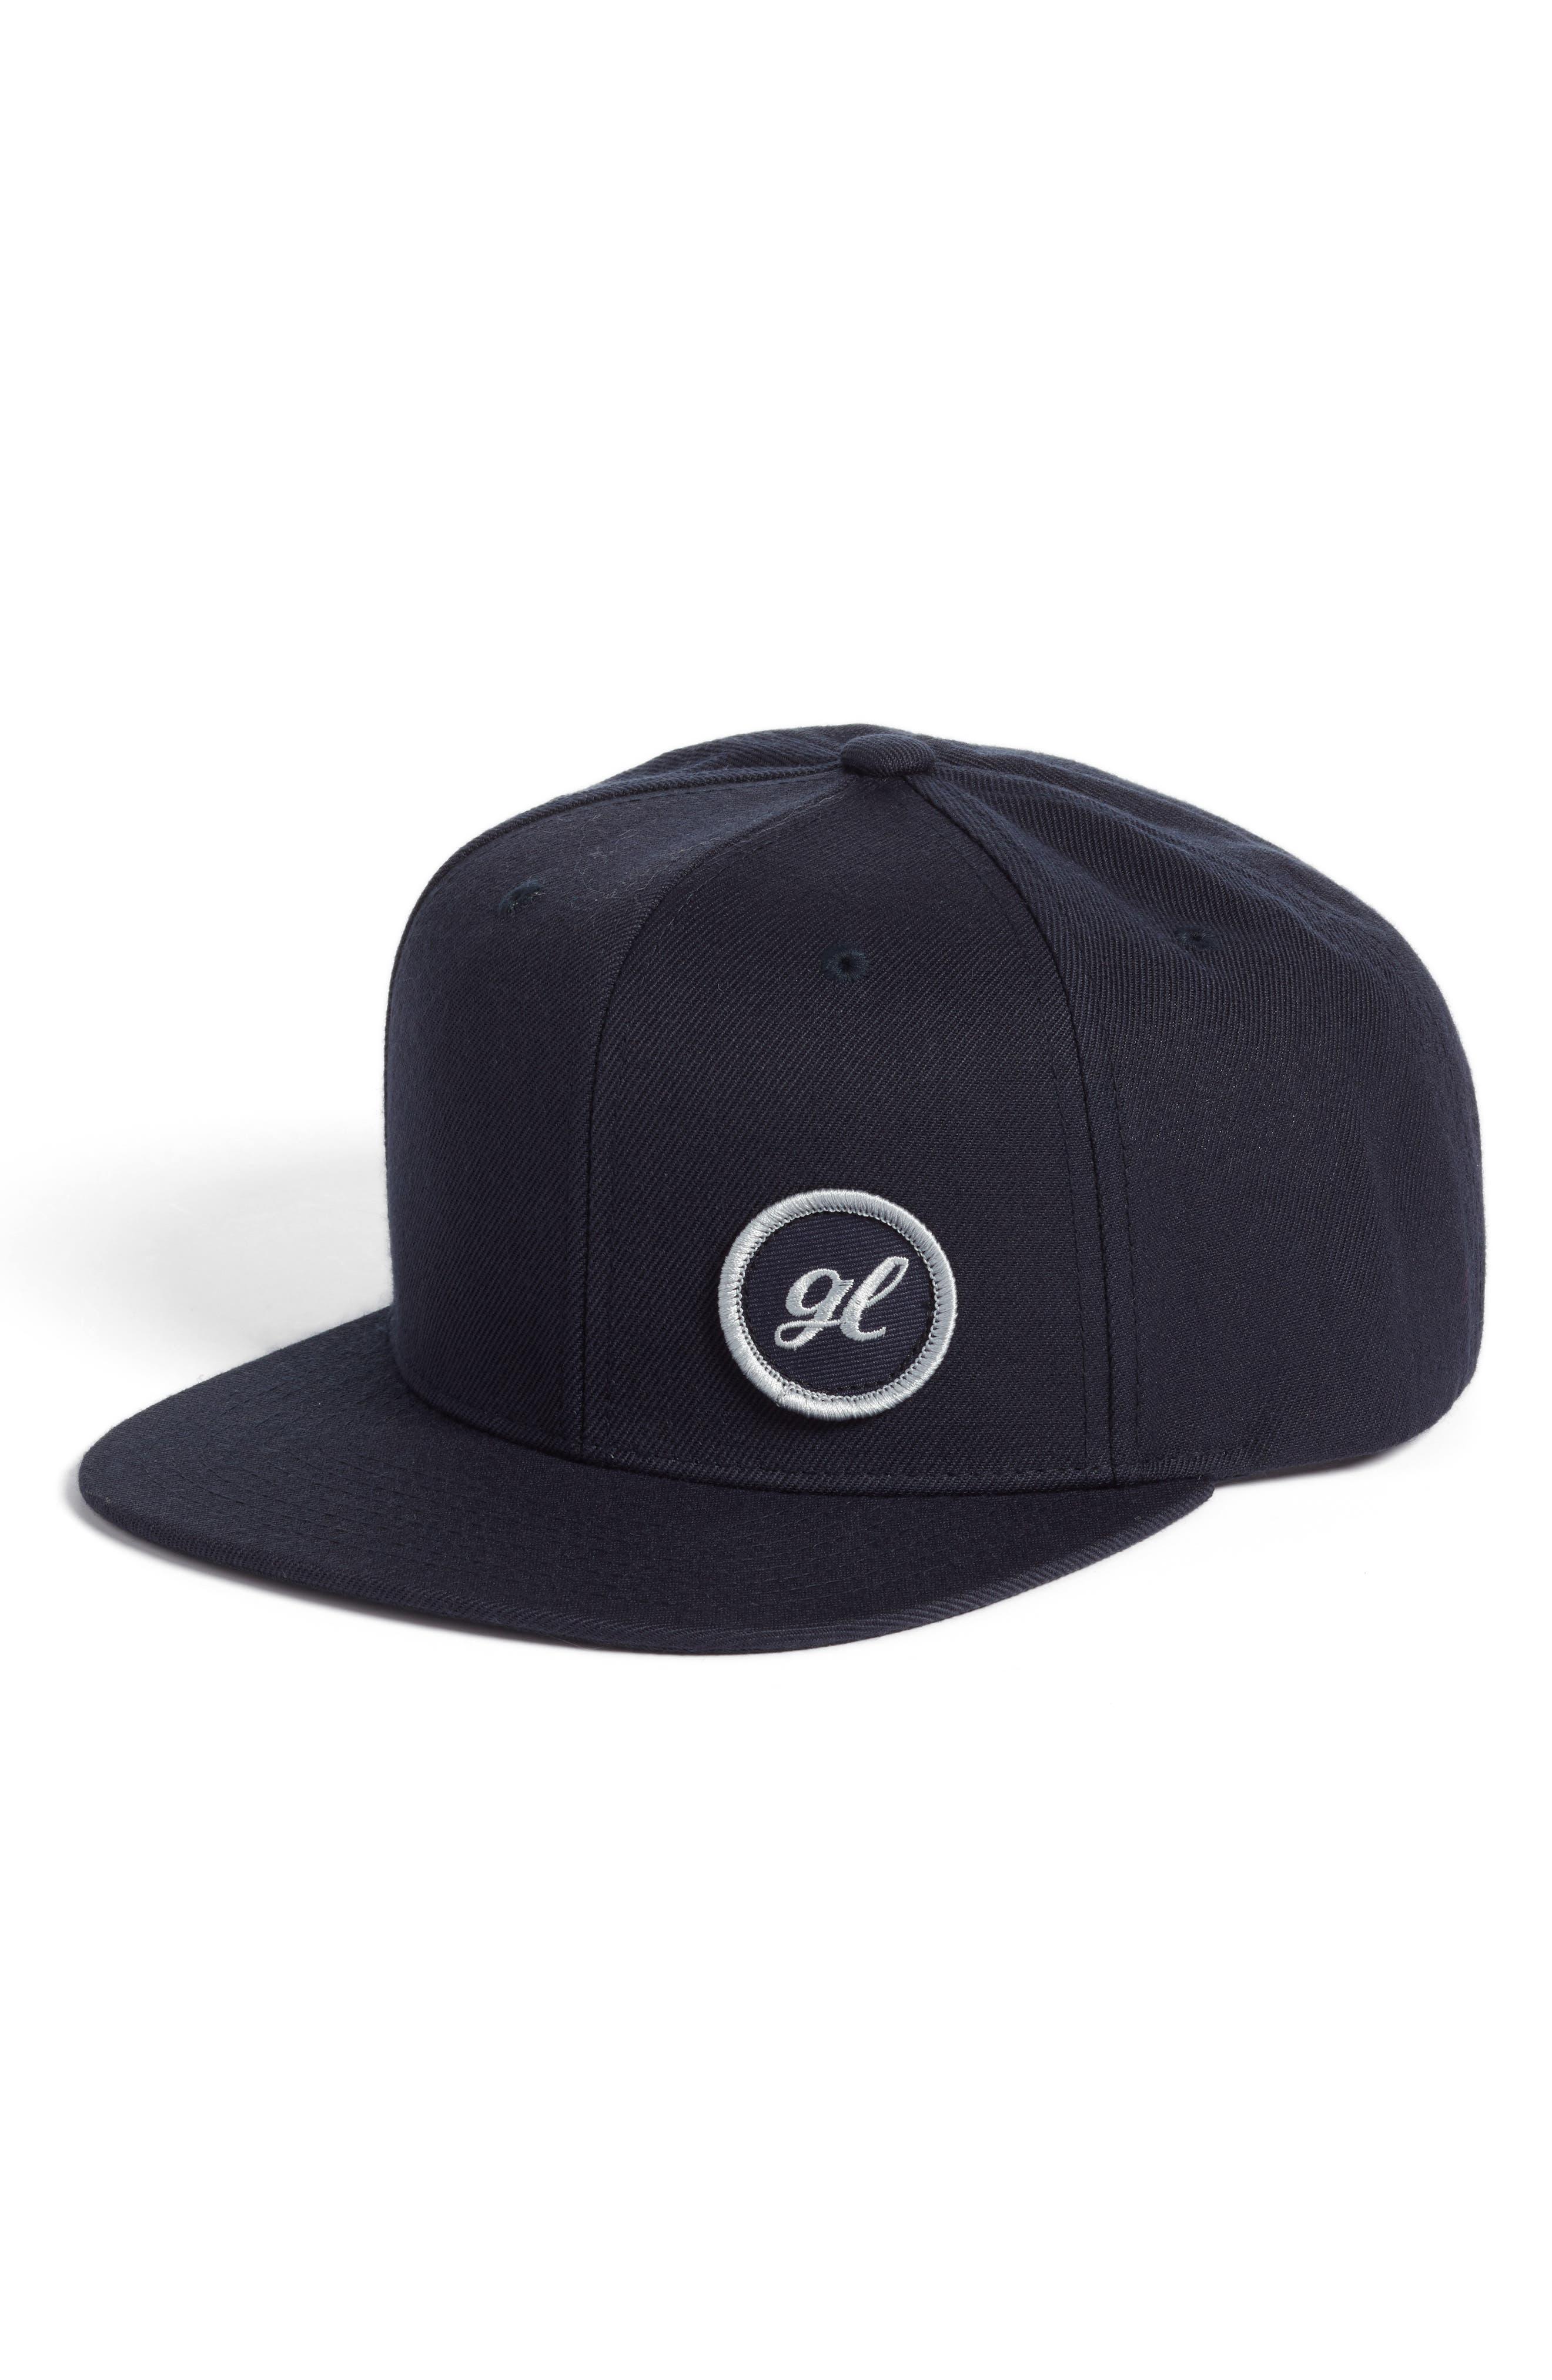 Goodlife Logo Embroidered Flat Brim Hat - Blue In Navy  08deebaa382